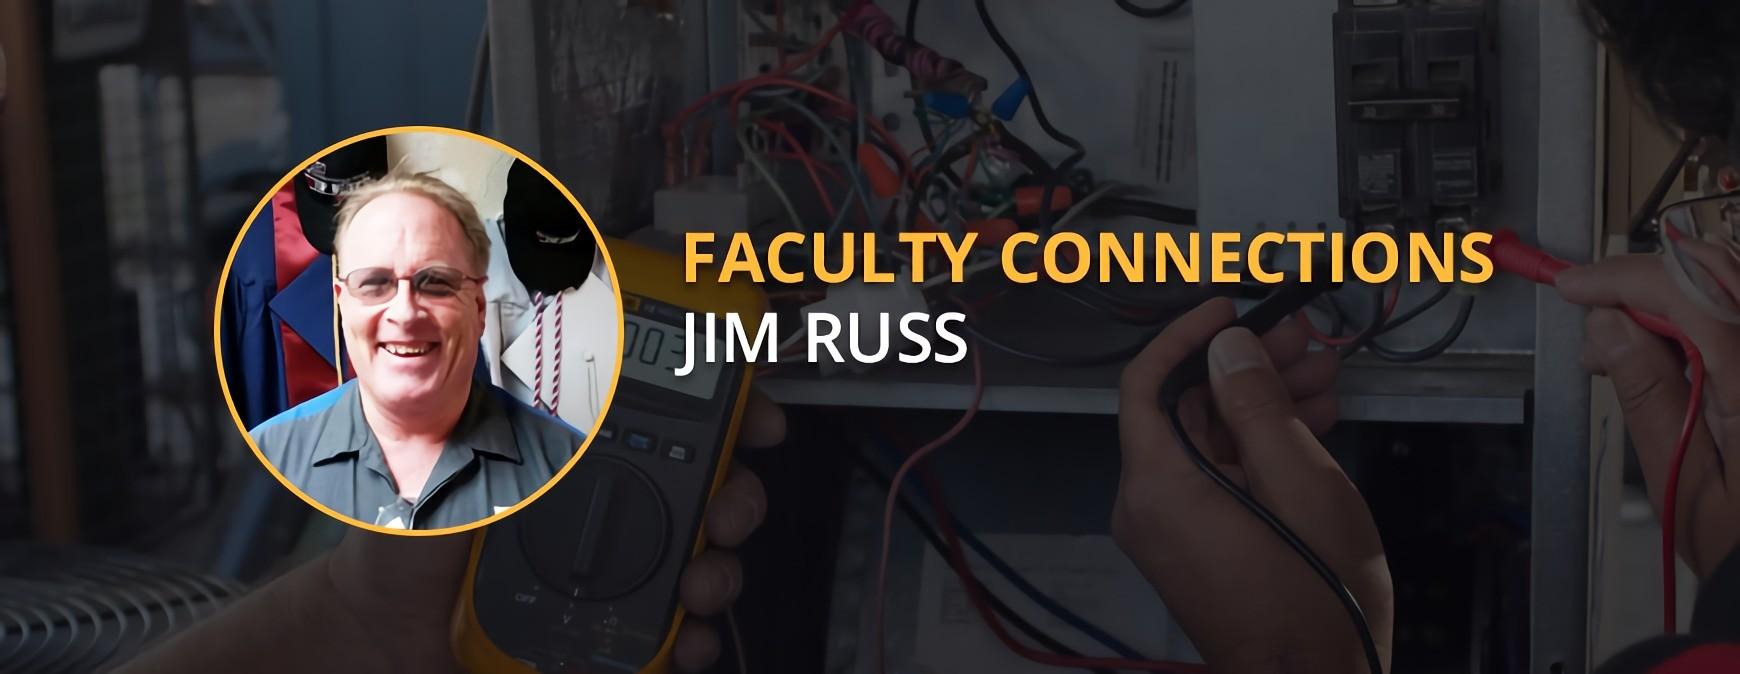 Jim Russ cover photo